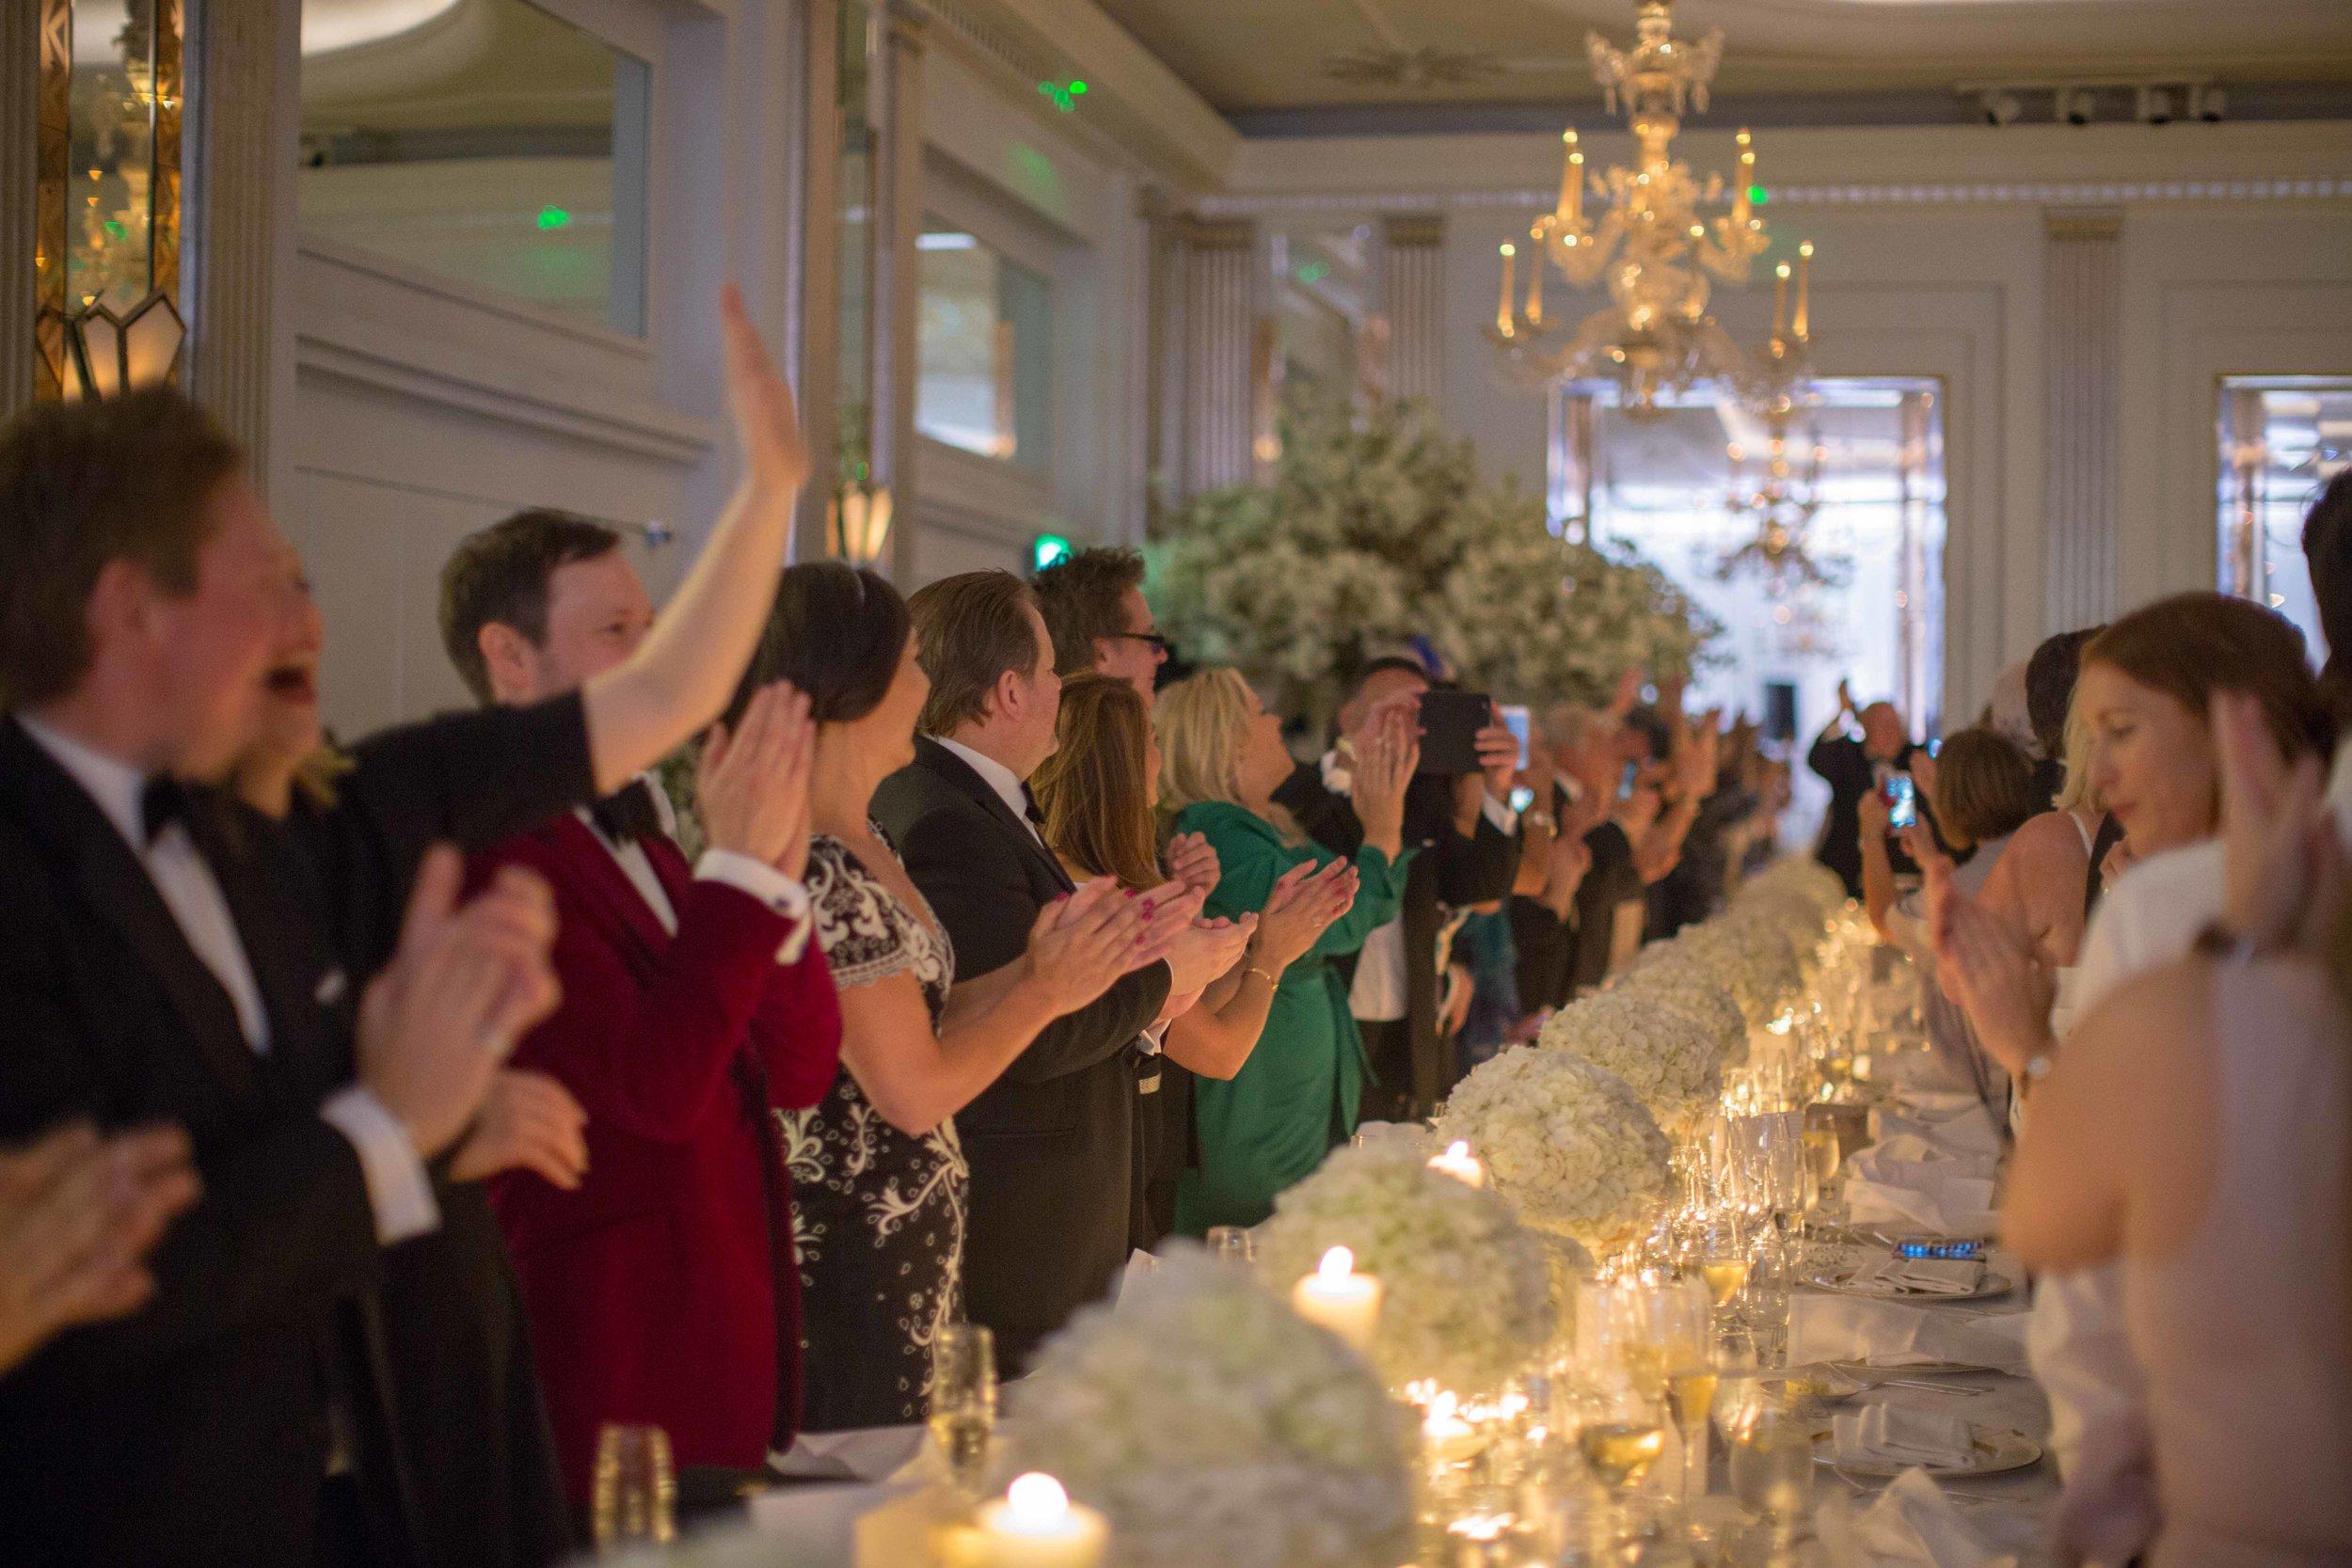 claridges-hotel-wedding-photographer-london-mayfair-natalia-smith-photography-106.jpg